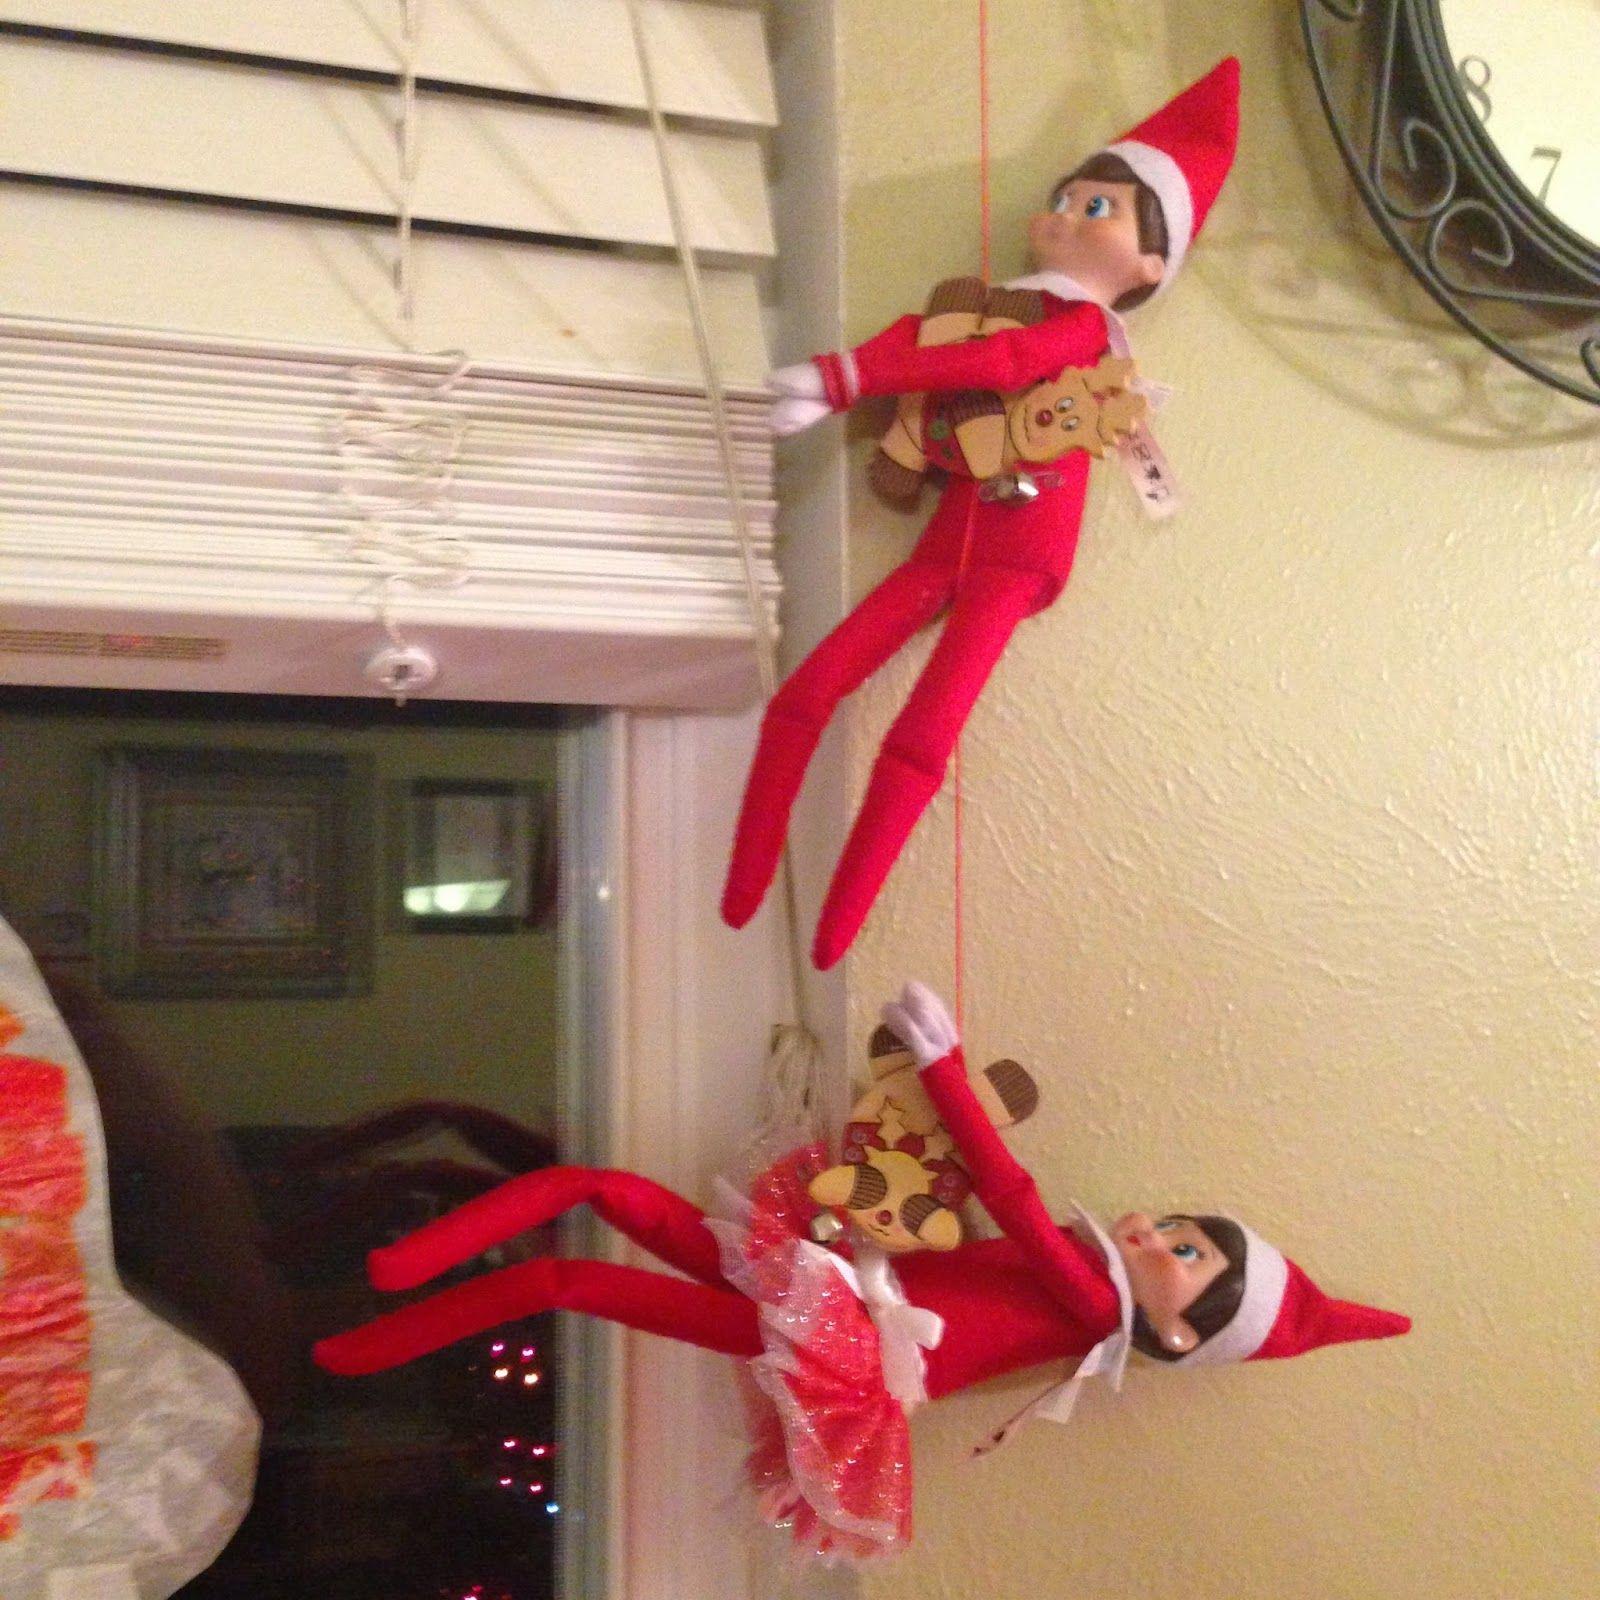 Elf On The Shelf Fun With 2 Elves Elf On The Shelf